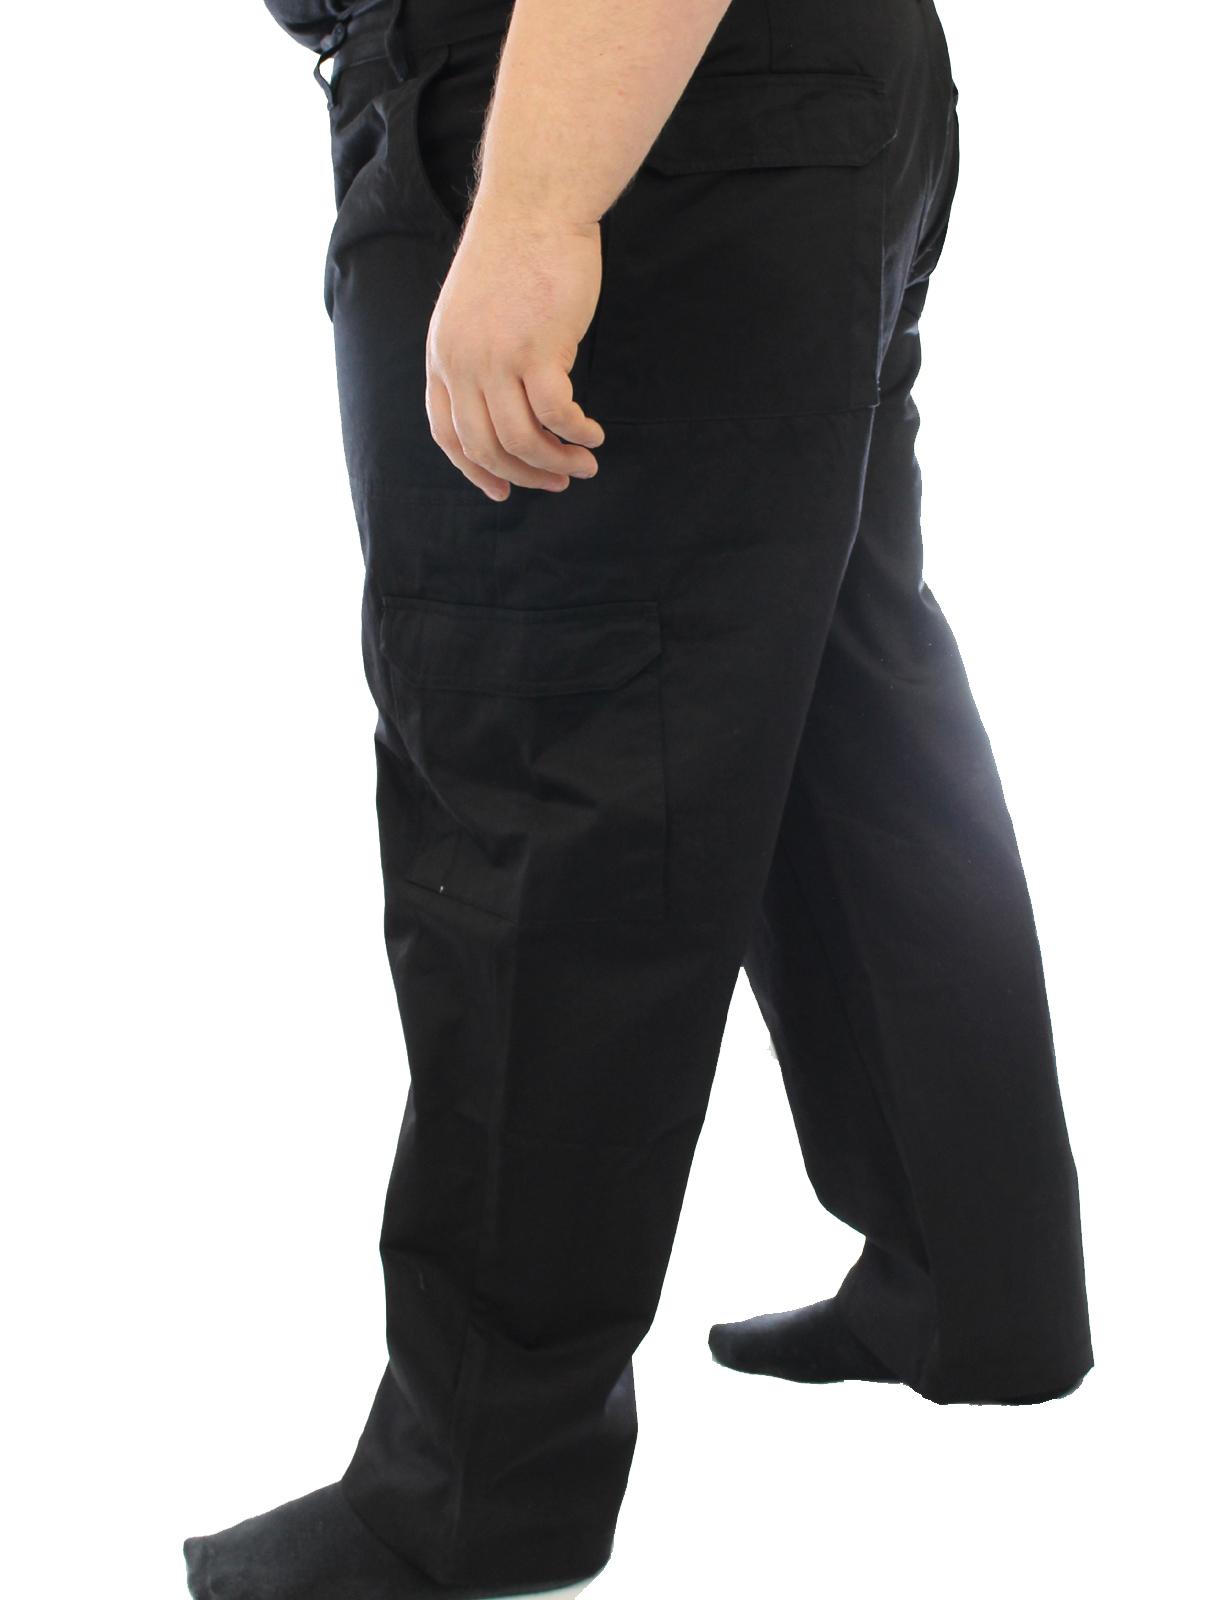 "Ed Baxter Victory - Heavy Duty Cargo Combat Trousers - Black - 46"" Waist, 30"" Leg"